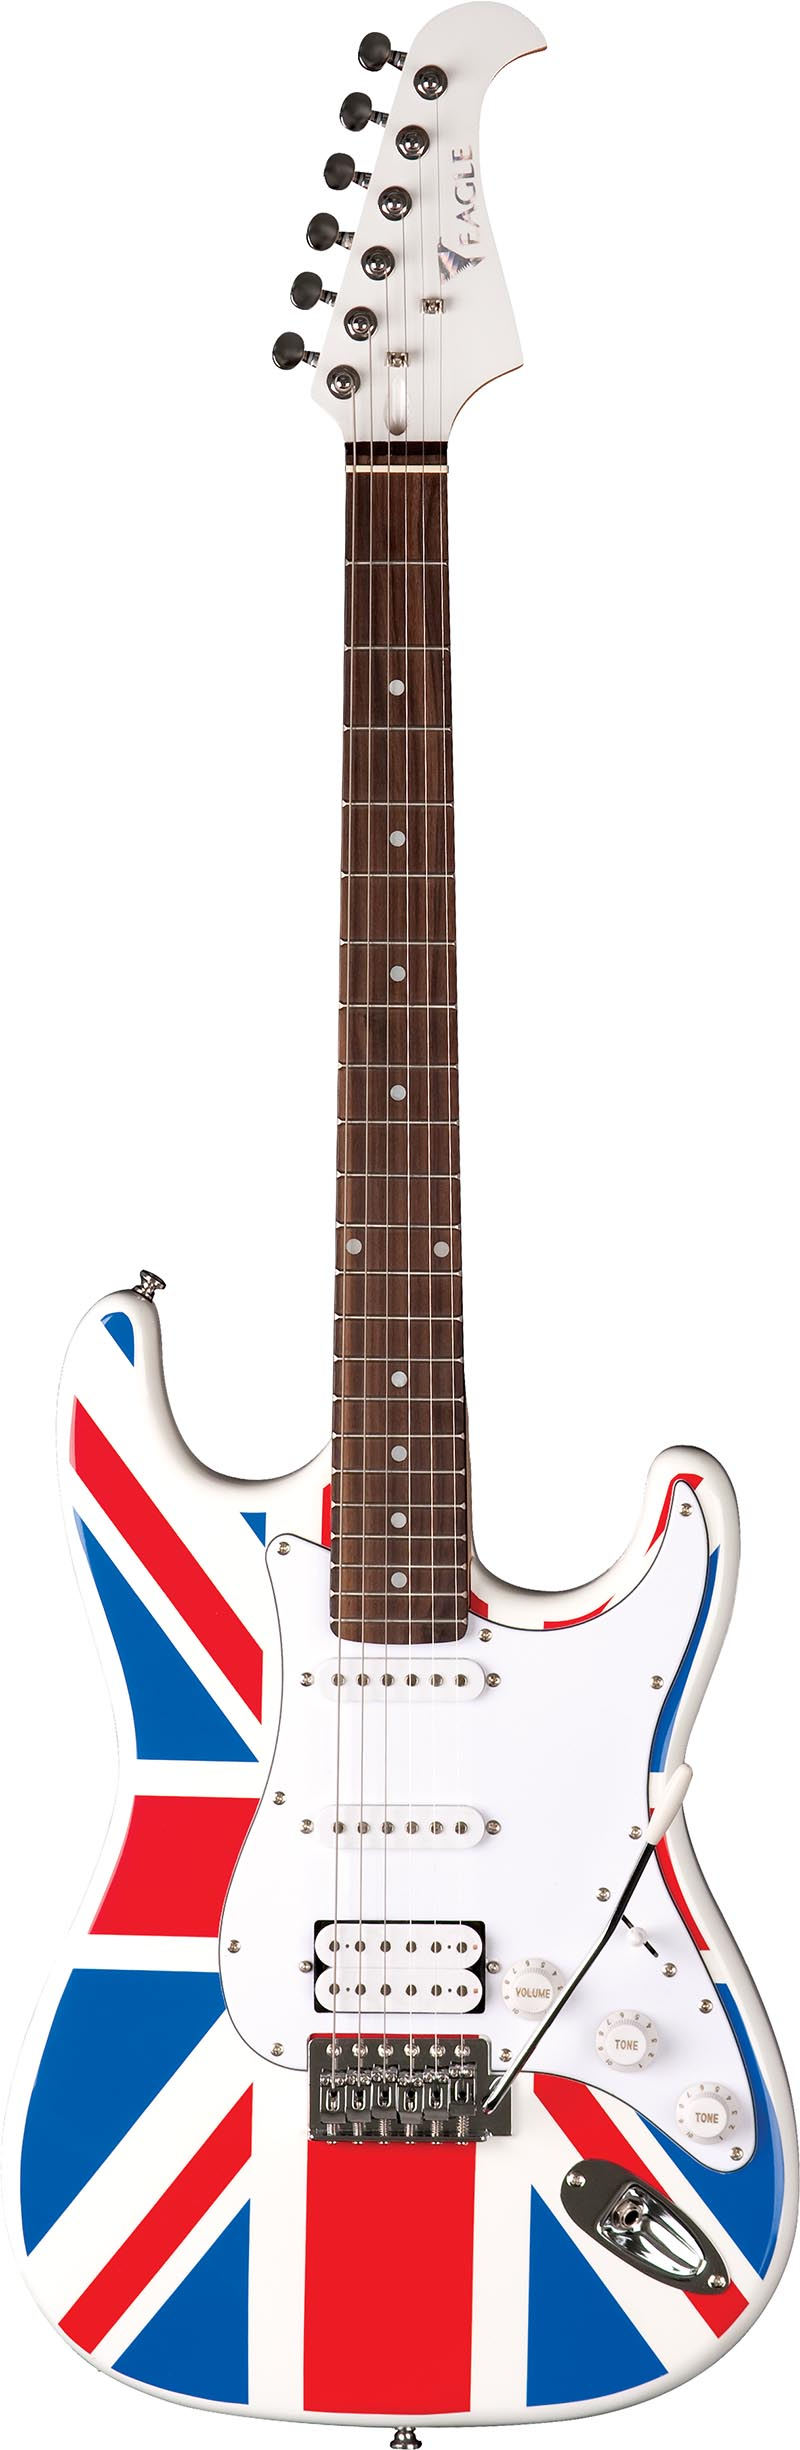 sts002 guitarra eletrica stratocaster captador humbucker eagle sts002 uk bandeira reino unido visao frontal vertical